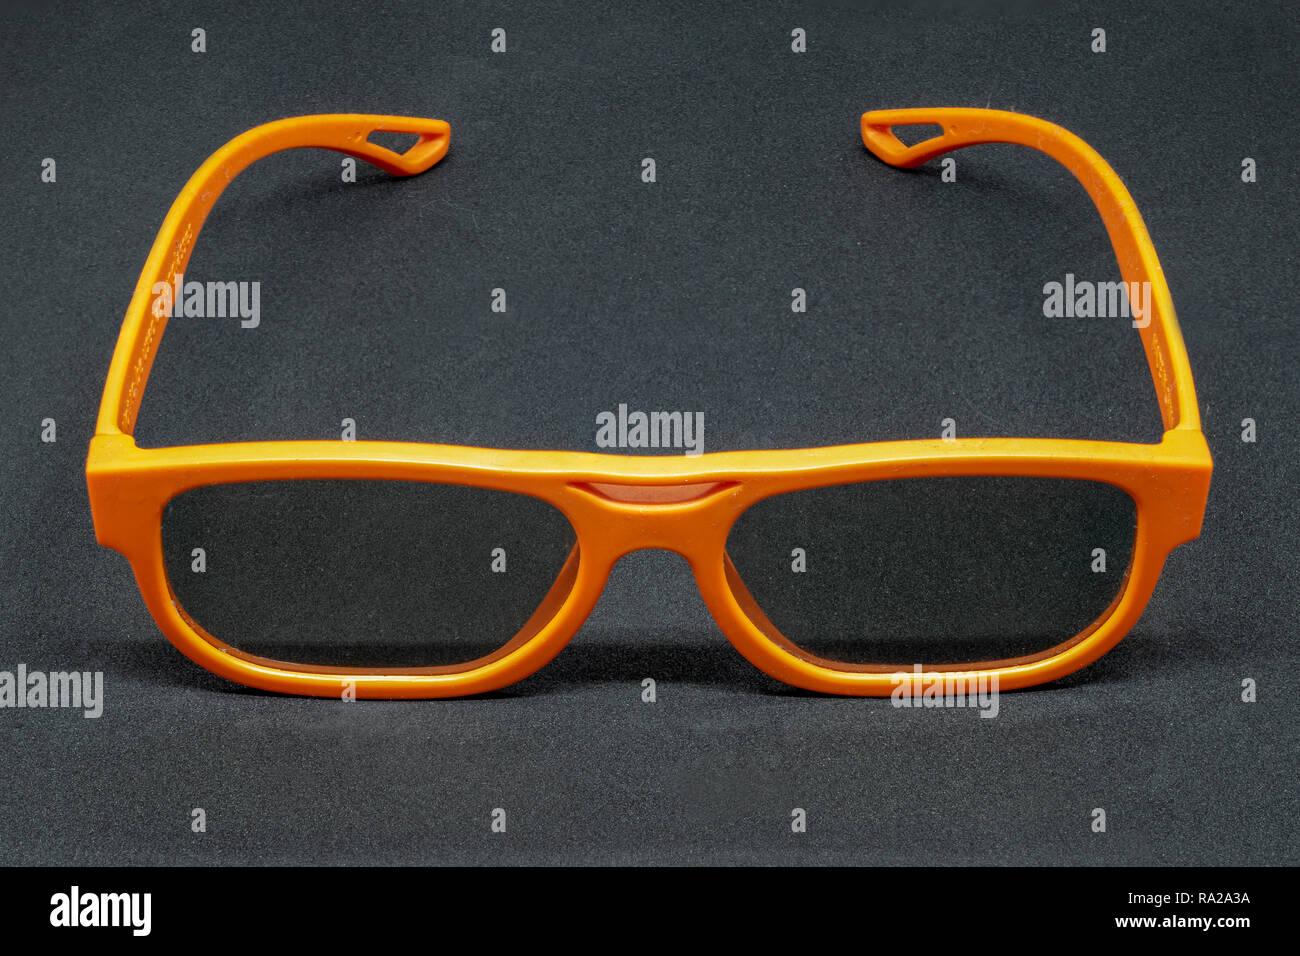 Orange 3 Dimensional glasses on a dark grey background - Stock Image